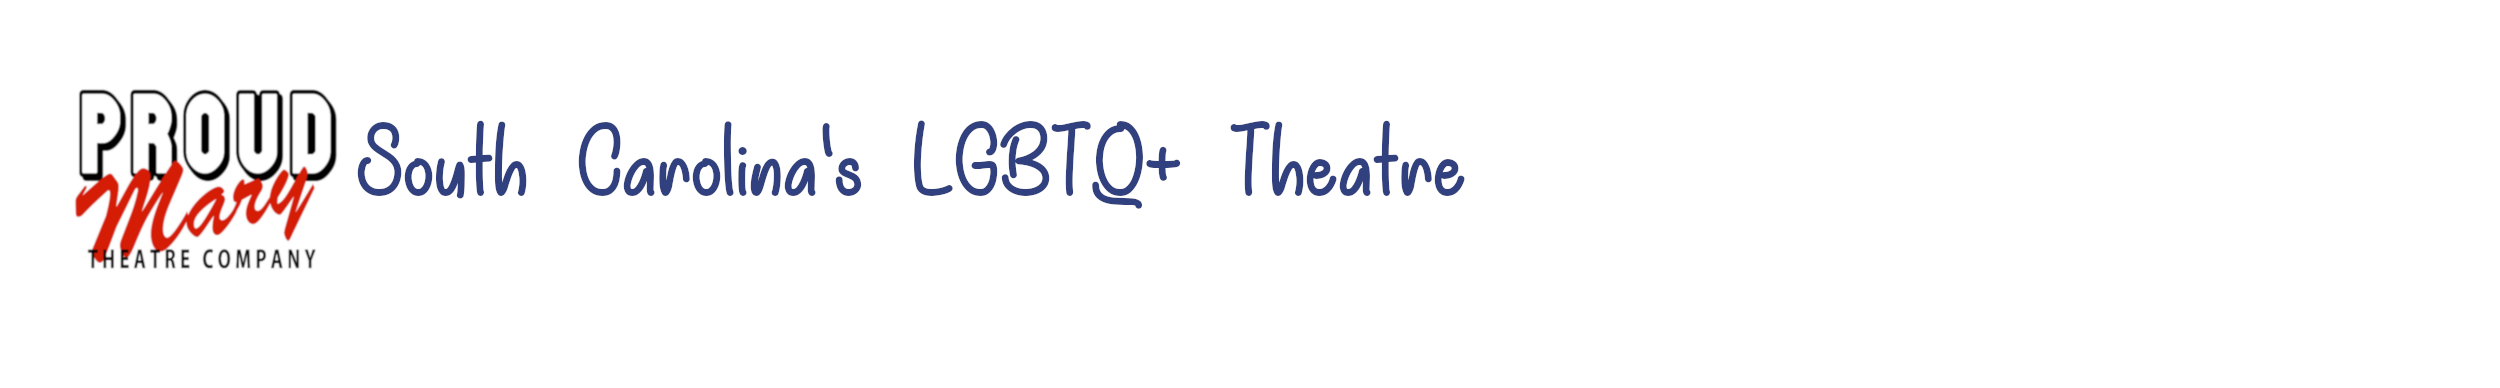 South Carolina's LGBTQ+ Theatre